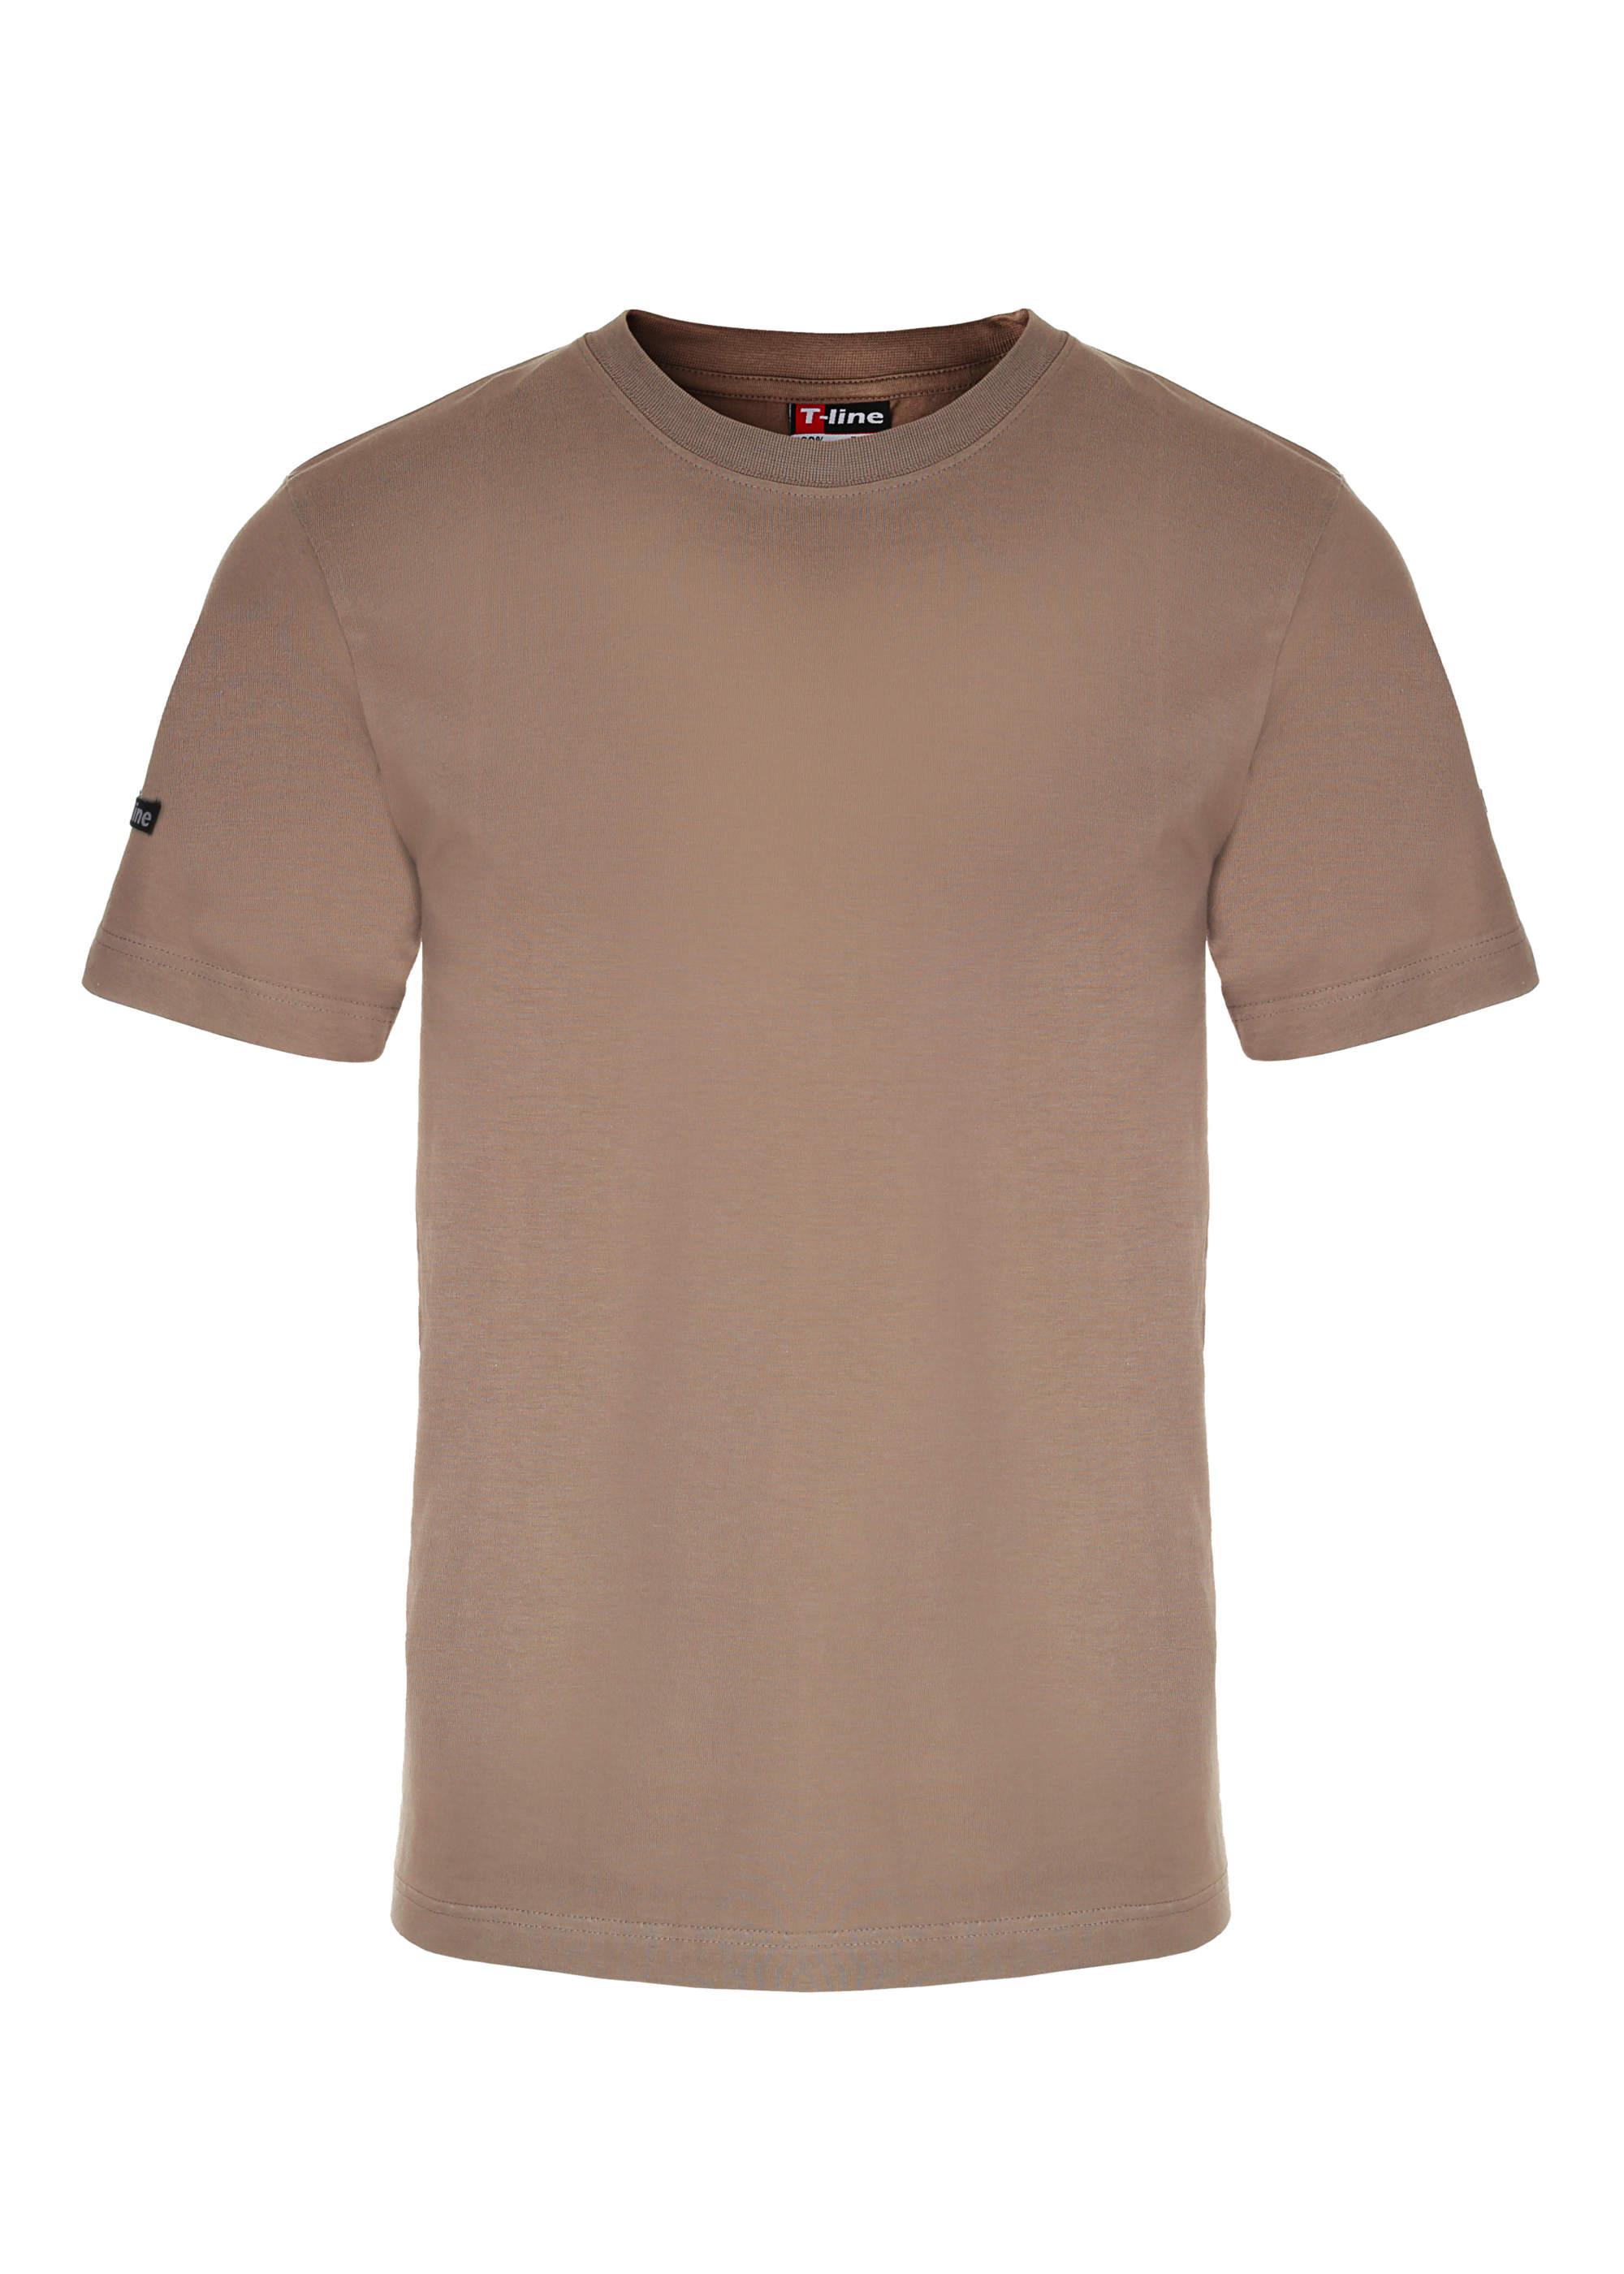 Koszulka HENDERSON T-Line